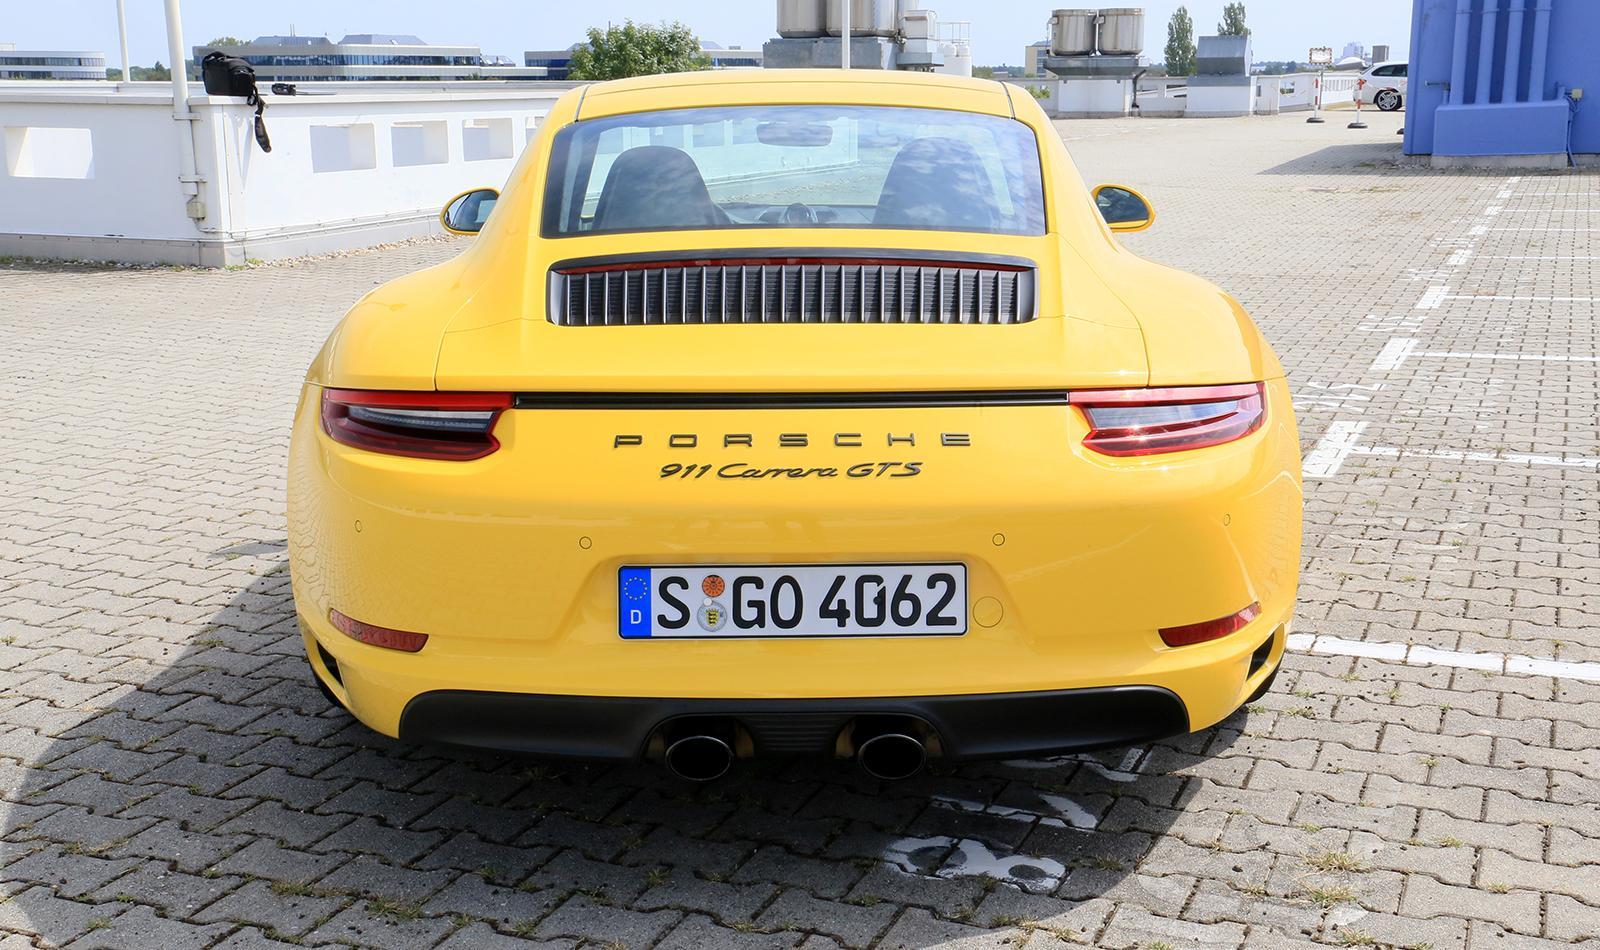 Porsche 911 Carrera GTS gelb Heckansicht parkend